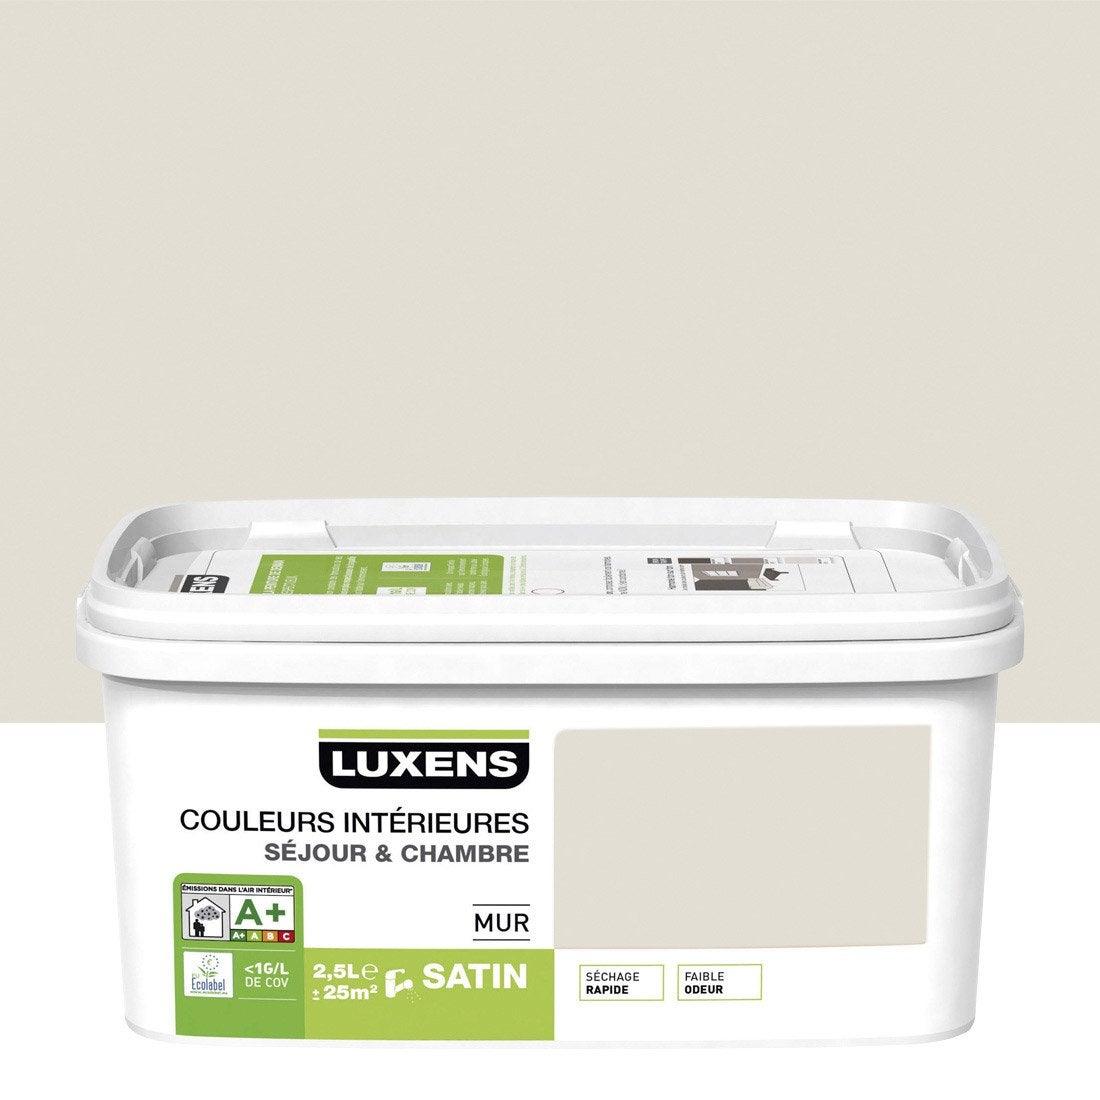 Peinture murale couleurs int rieures luxens blanc lin n 2 - Peinture blanc lin ...